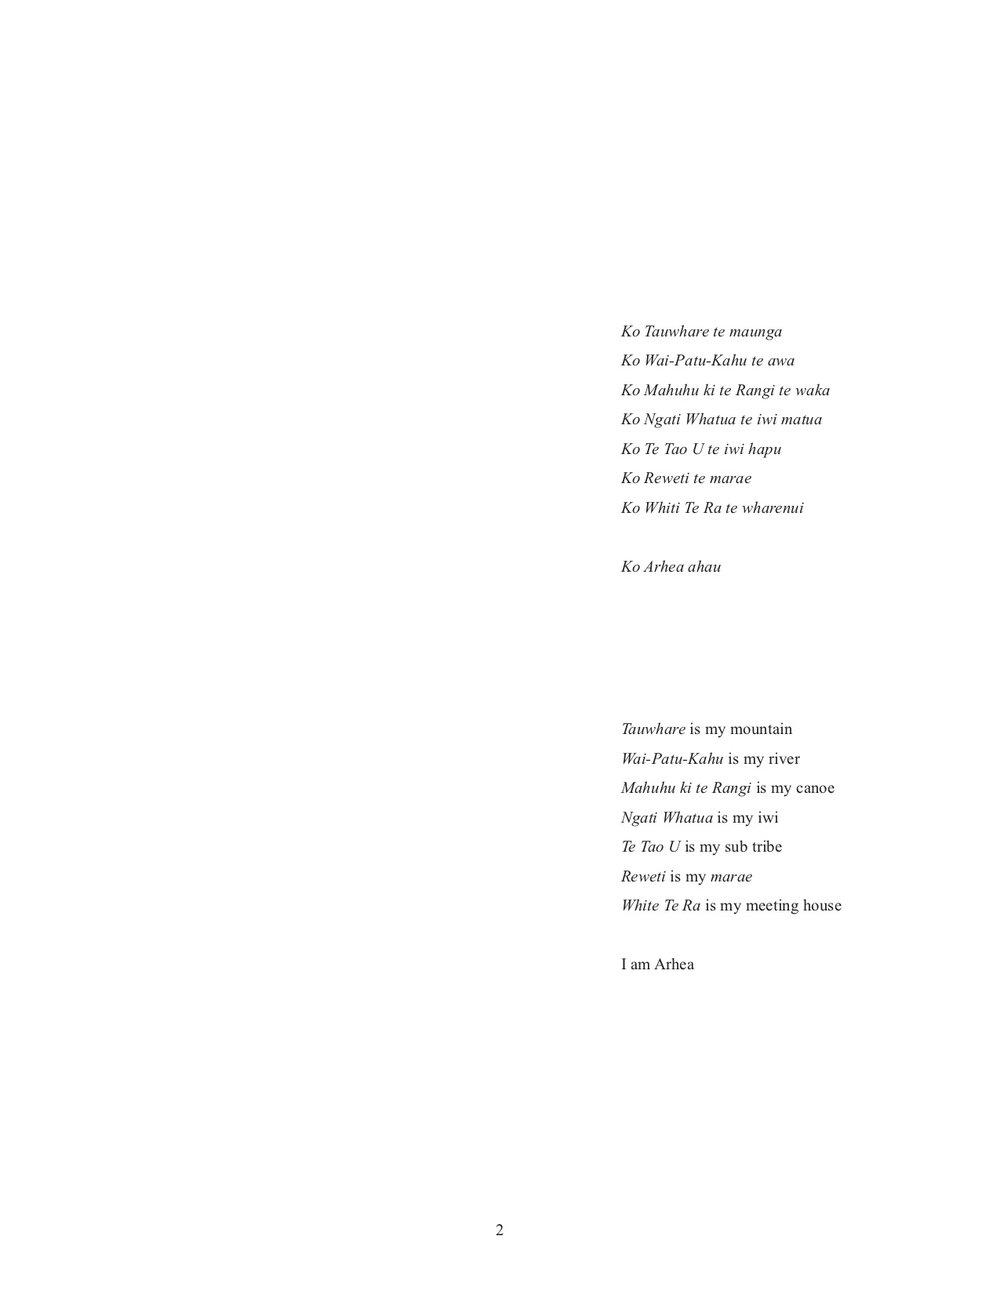 ArheaMawhinney_Hello, My Other Self (dragged) 3.jpg